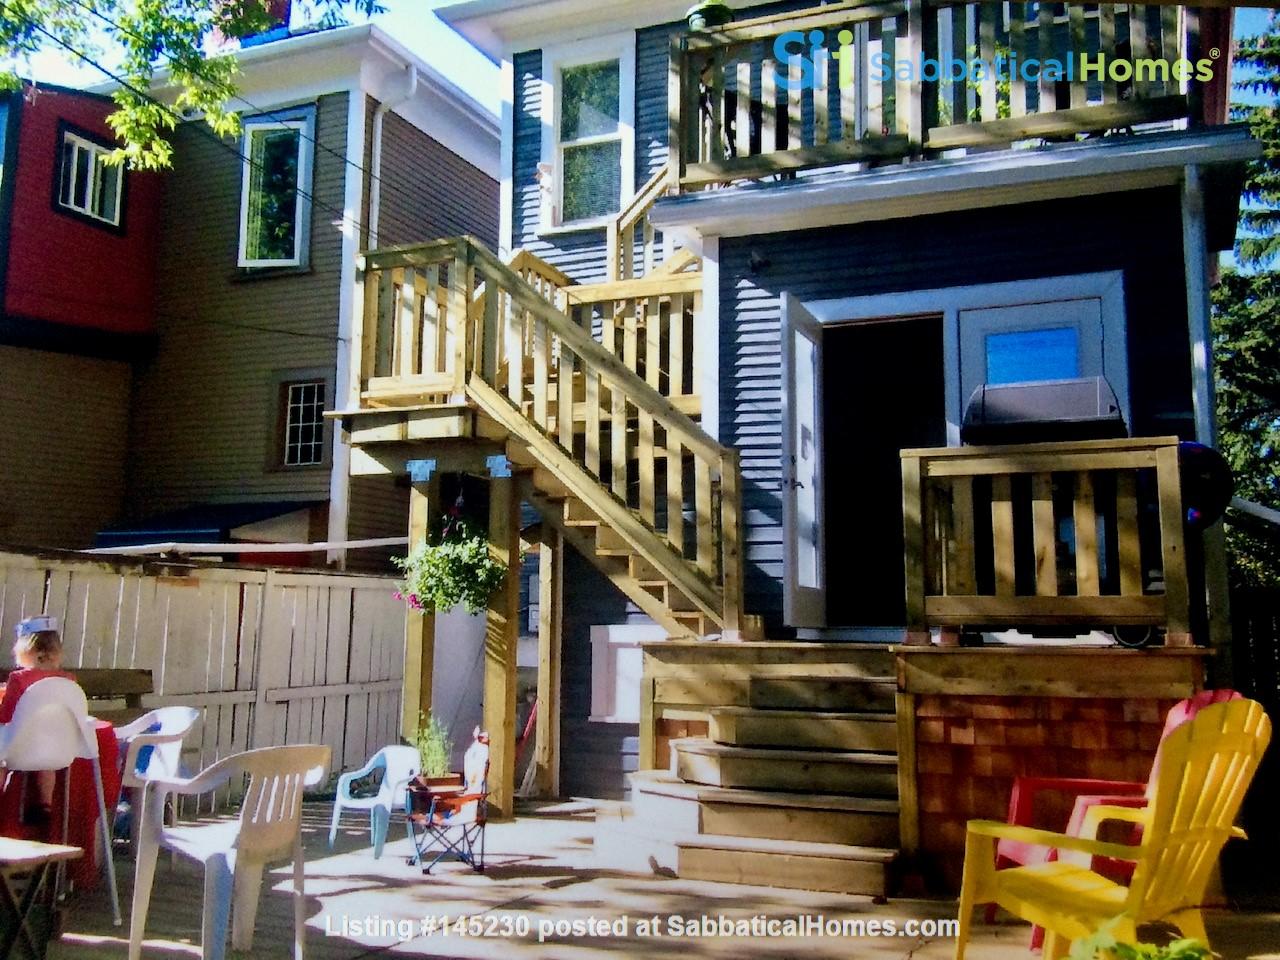 Beautiful historic home in sought after Calgary neighbourhood Home Rental in Calgary, Alberta, Canada 2